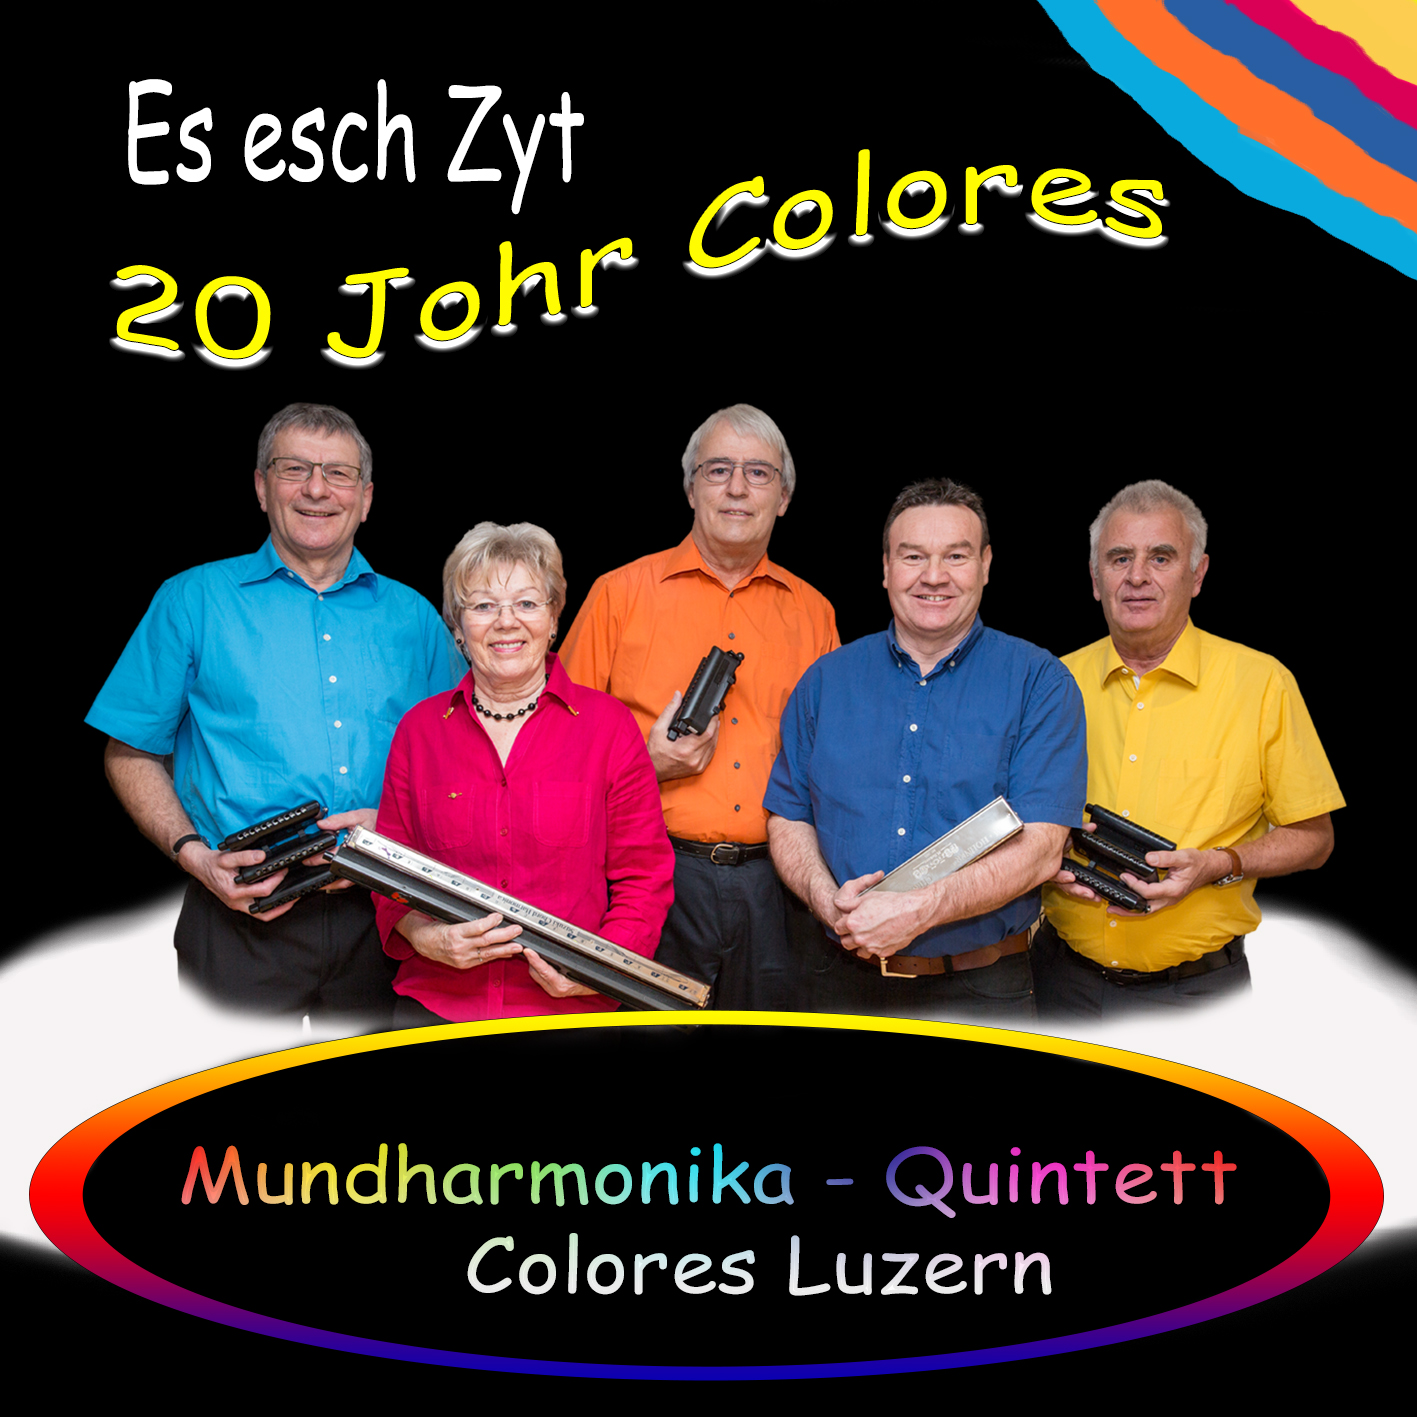 CD Cover 10fjpg